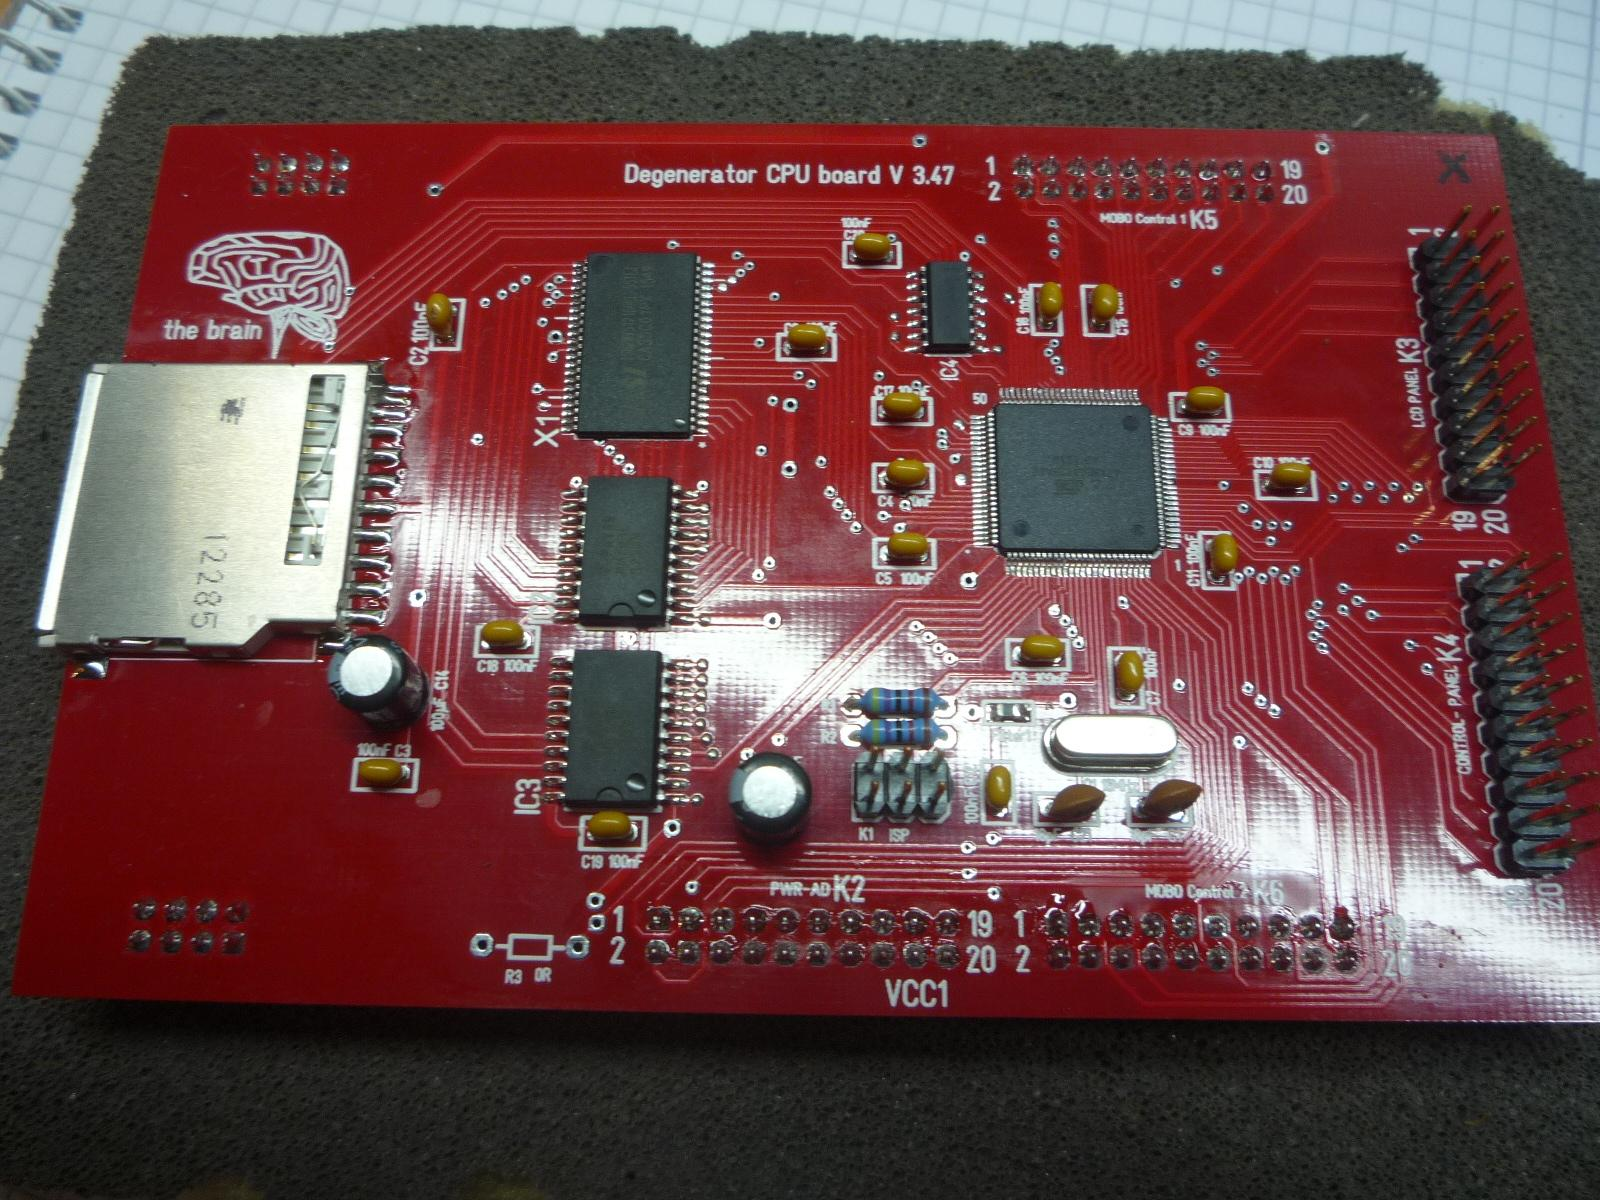 CPU PCB from DE:GENERATOR